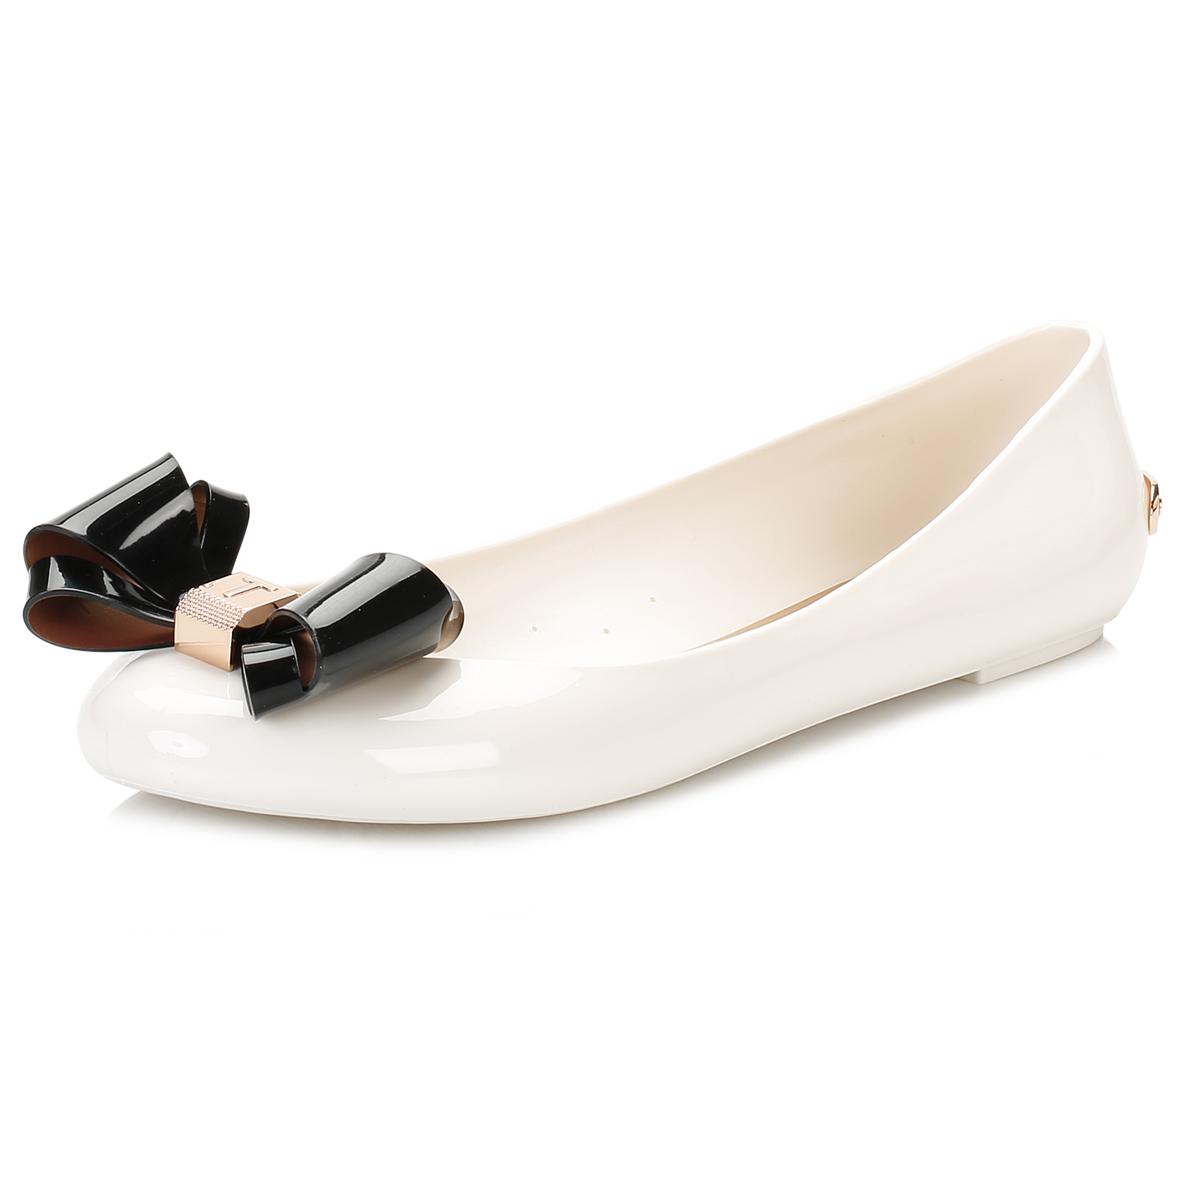 d6733e9a72bc4 Details about Ted Baker Womens White Julivia Ballerina Flats